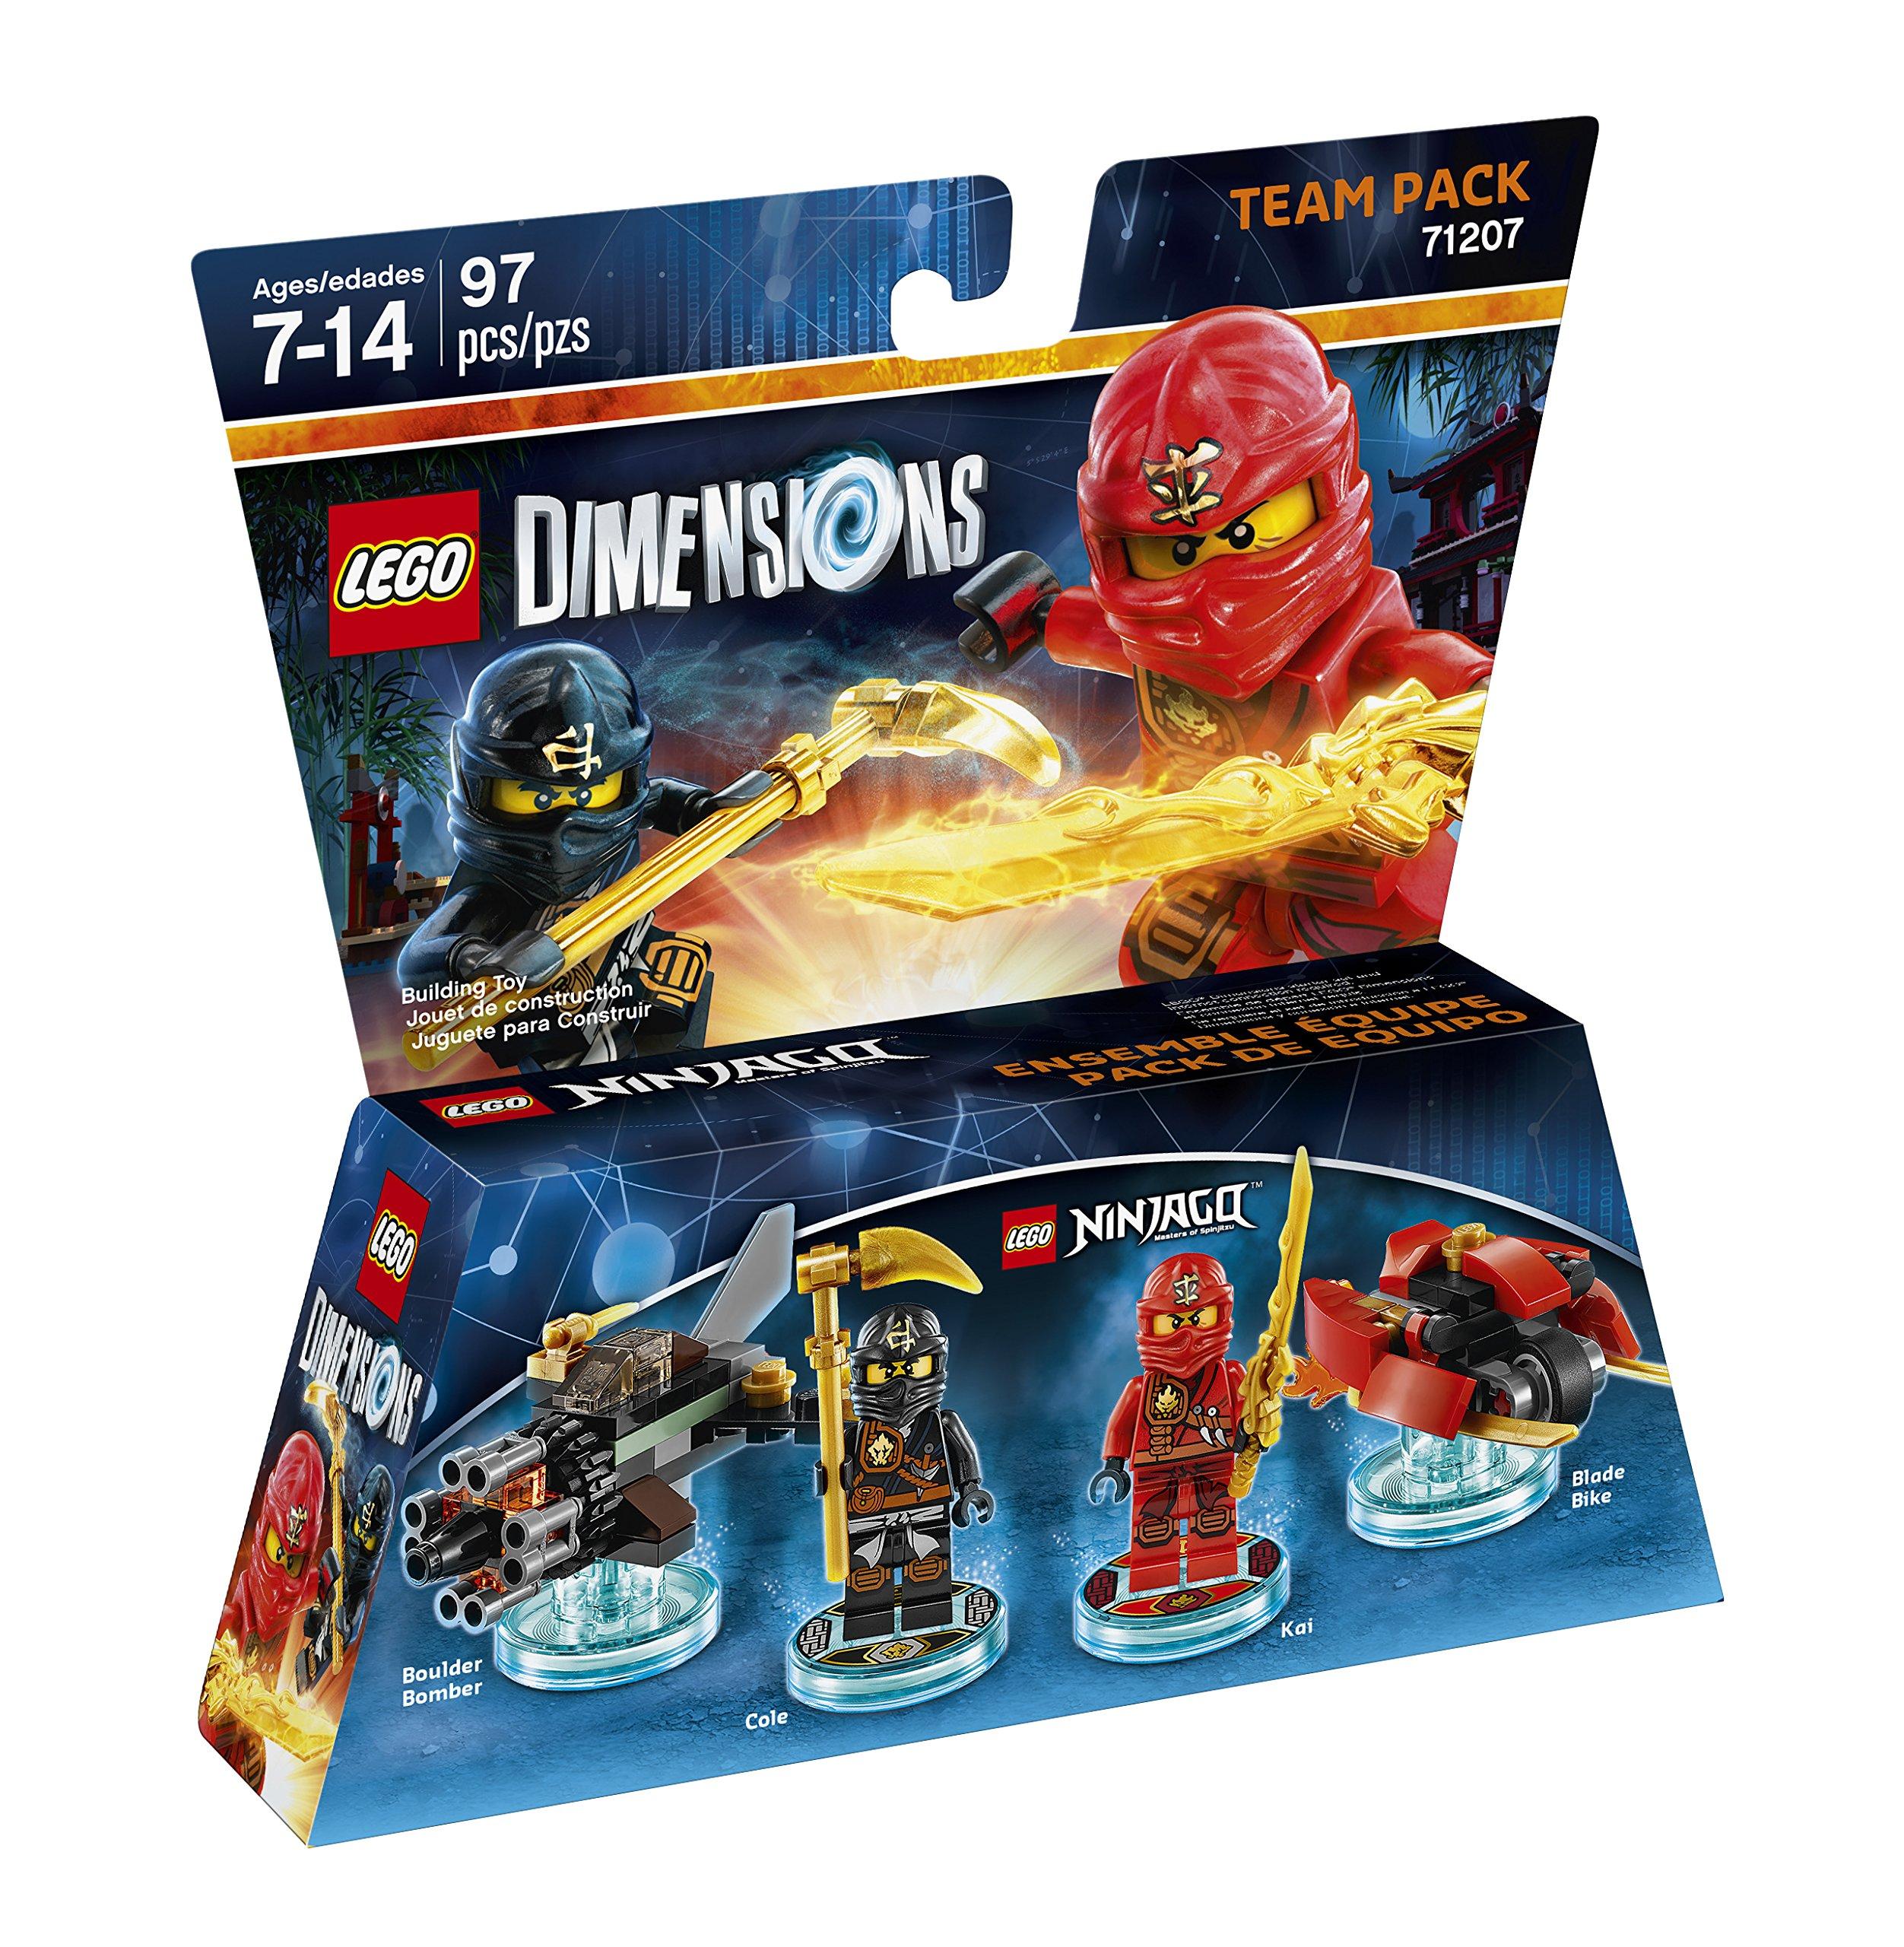 Ninjago Team Pack Lego Dimensions Tiendamiacom